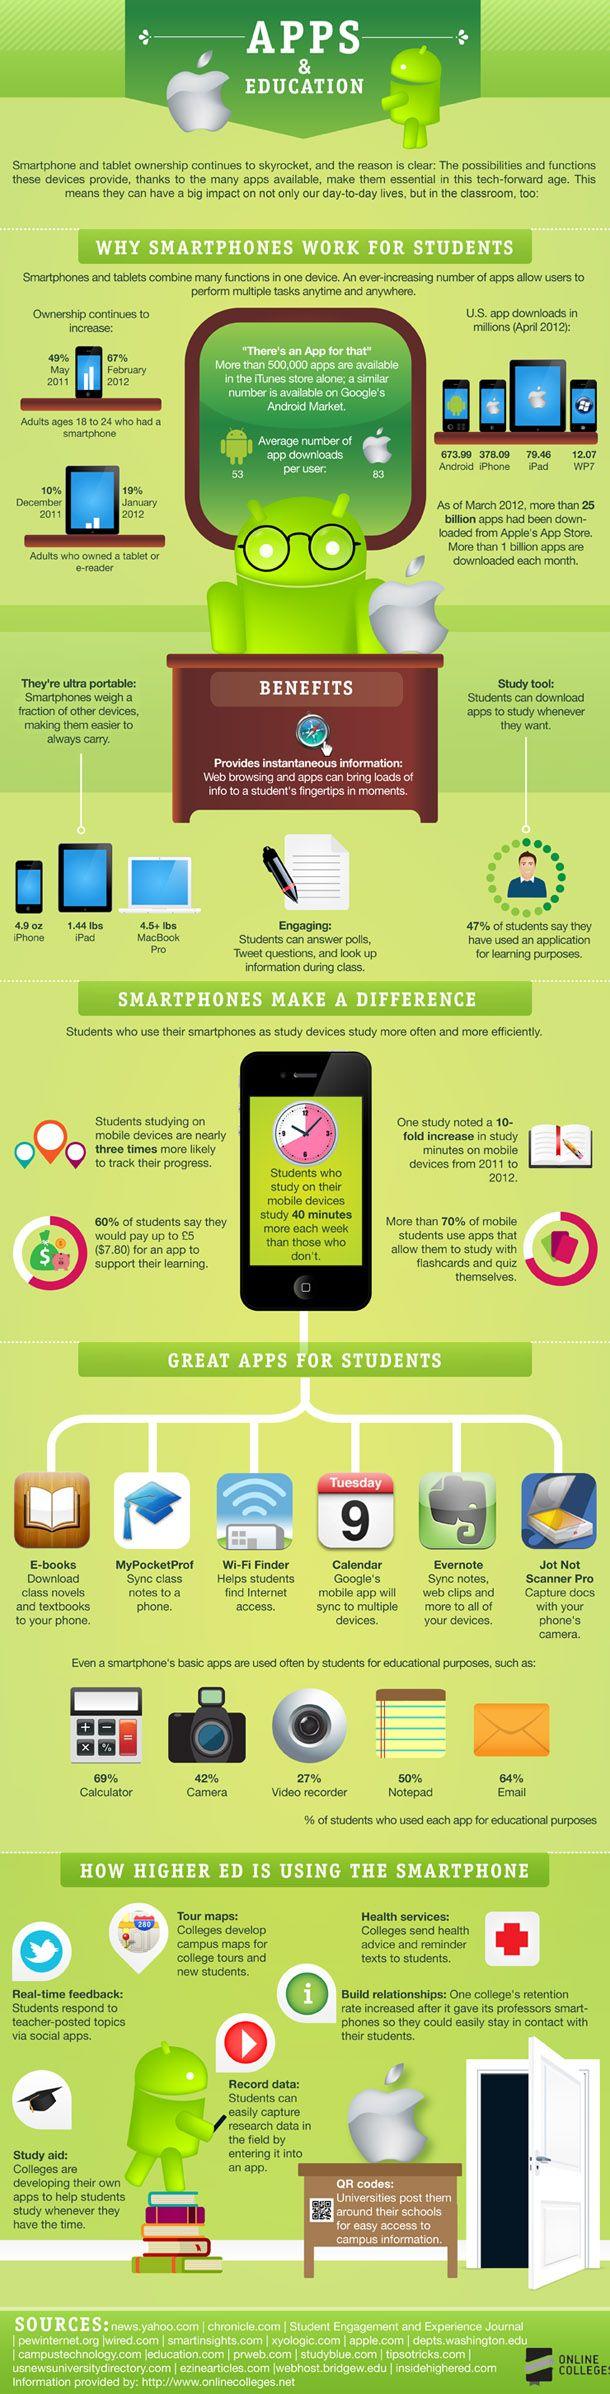 #vivapositivamente @rodirgostoledo mostra infografico sobre smartphones e tablets na educacao. http://rodrigostoledo.com/2012/08/10/smartphones-e-tablets-na-educacao/